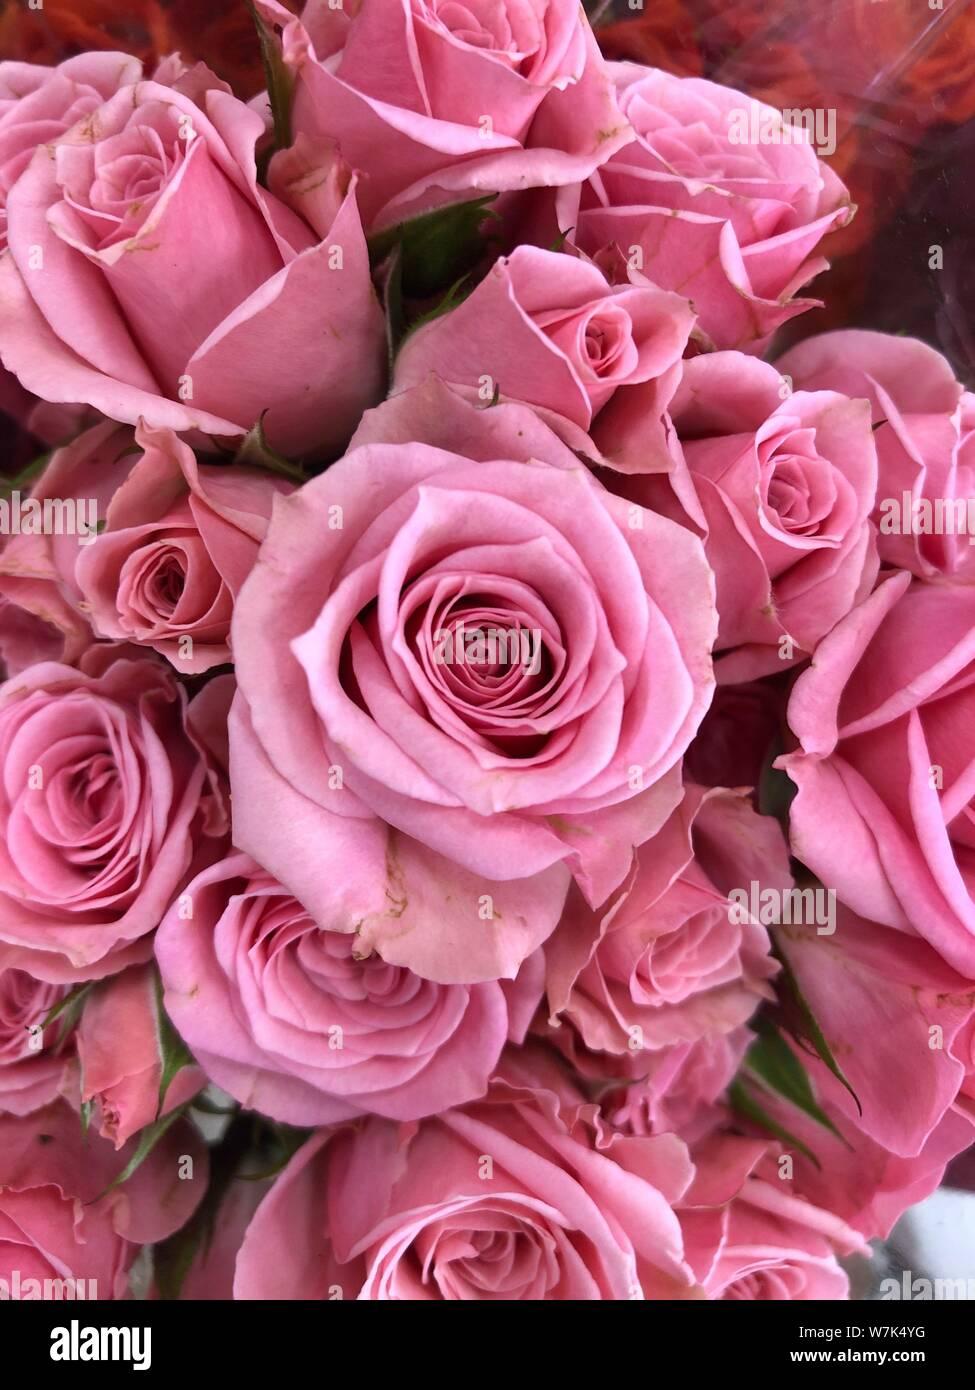 Rose Wallpaper Beautiful Flowers Images